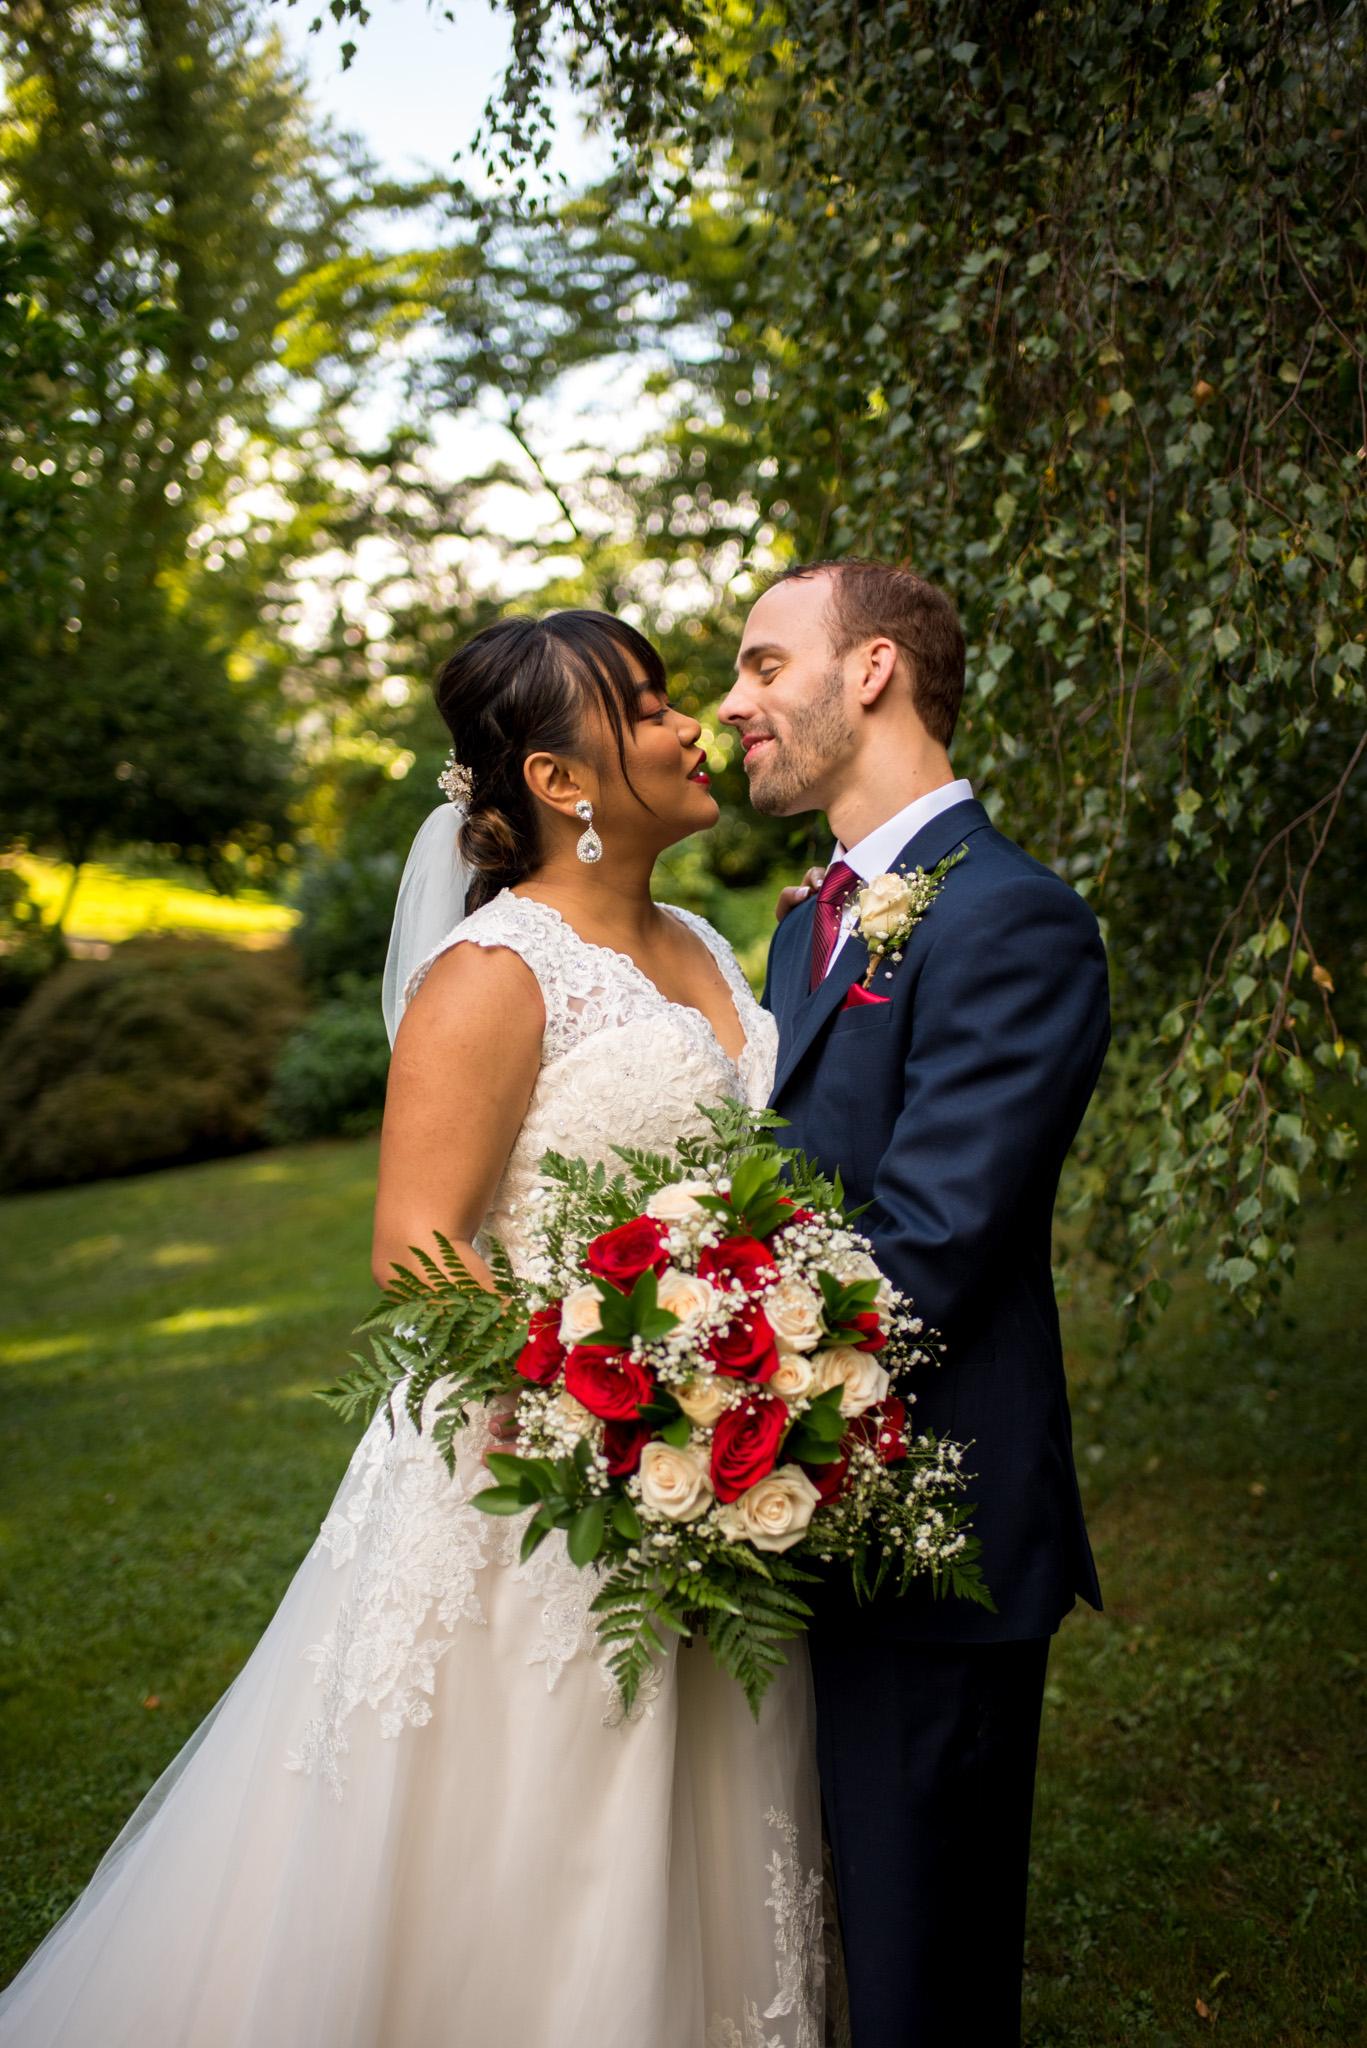 New Westminster Wedding Photographer-35.jpg